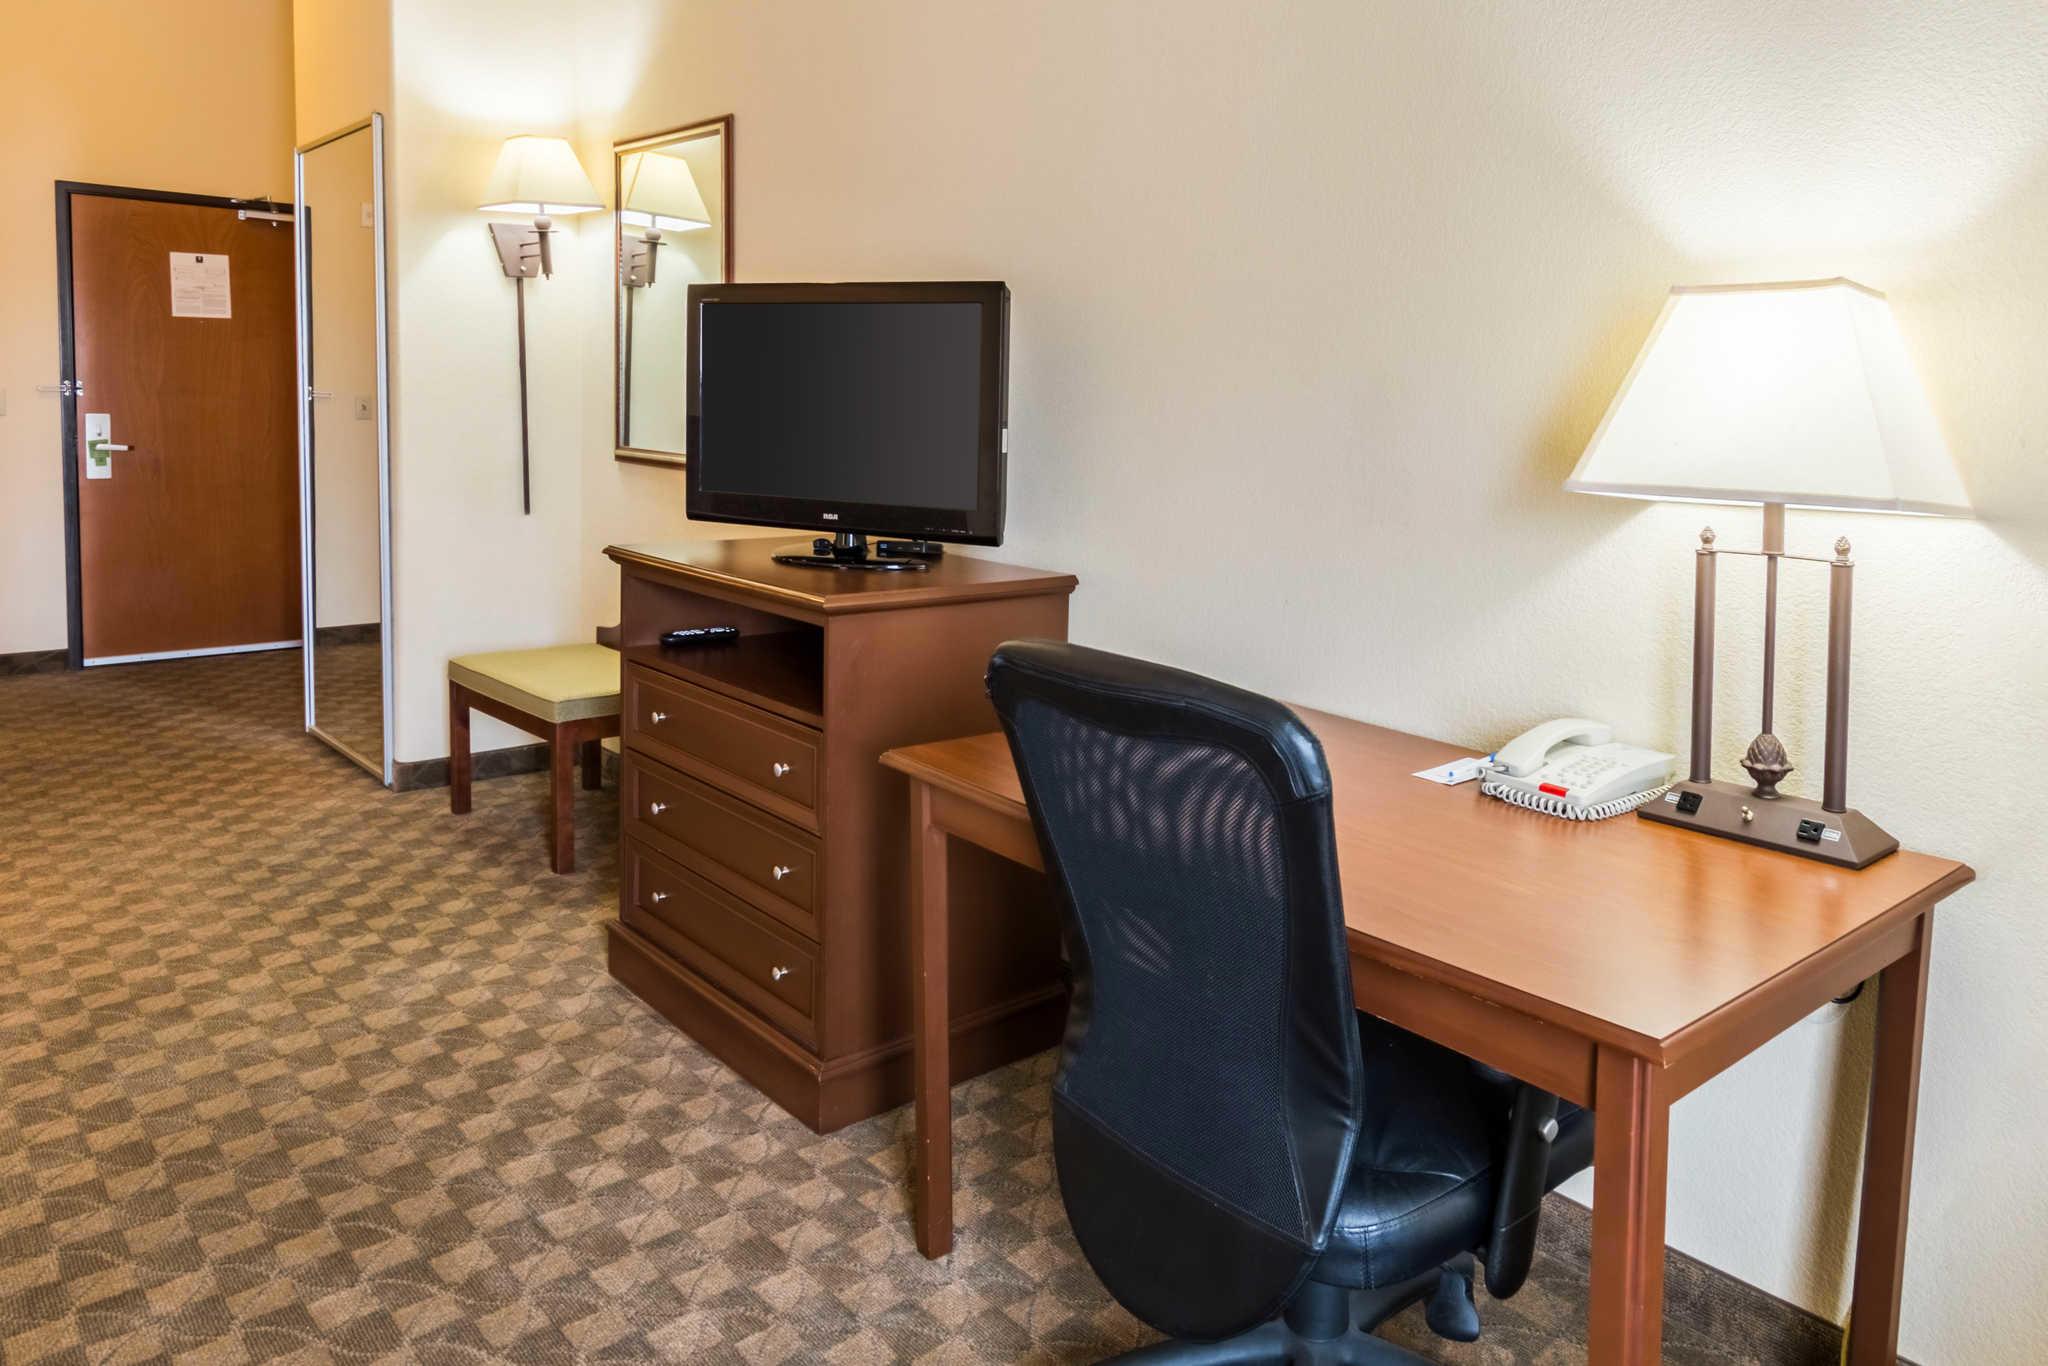 Comfort Inn & Suites near Comanche Peak image 20